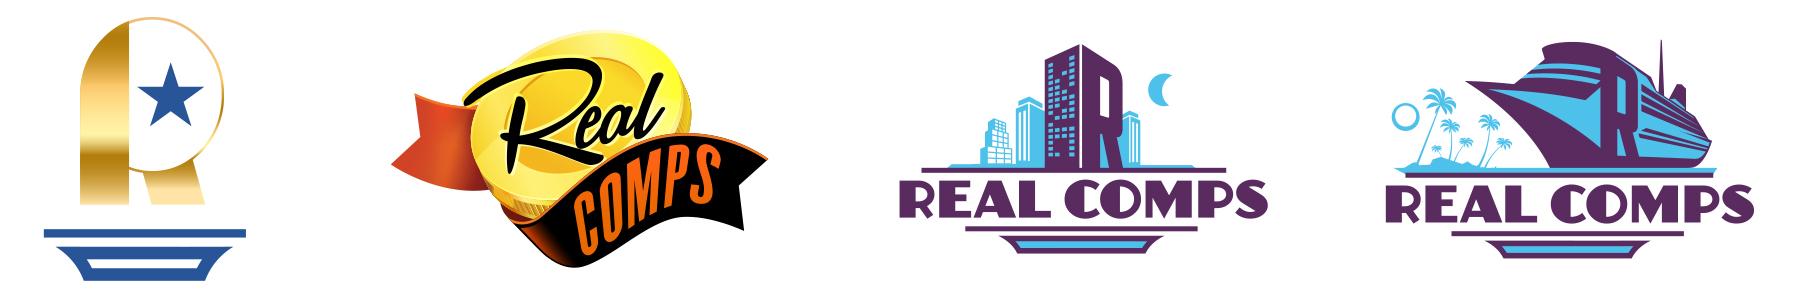 RealComp-exploration.jpg